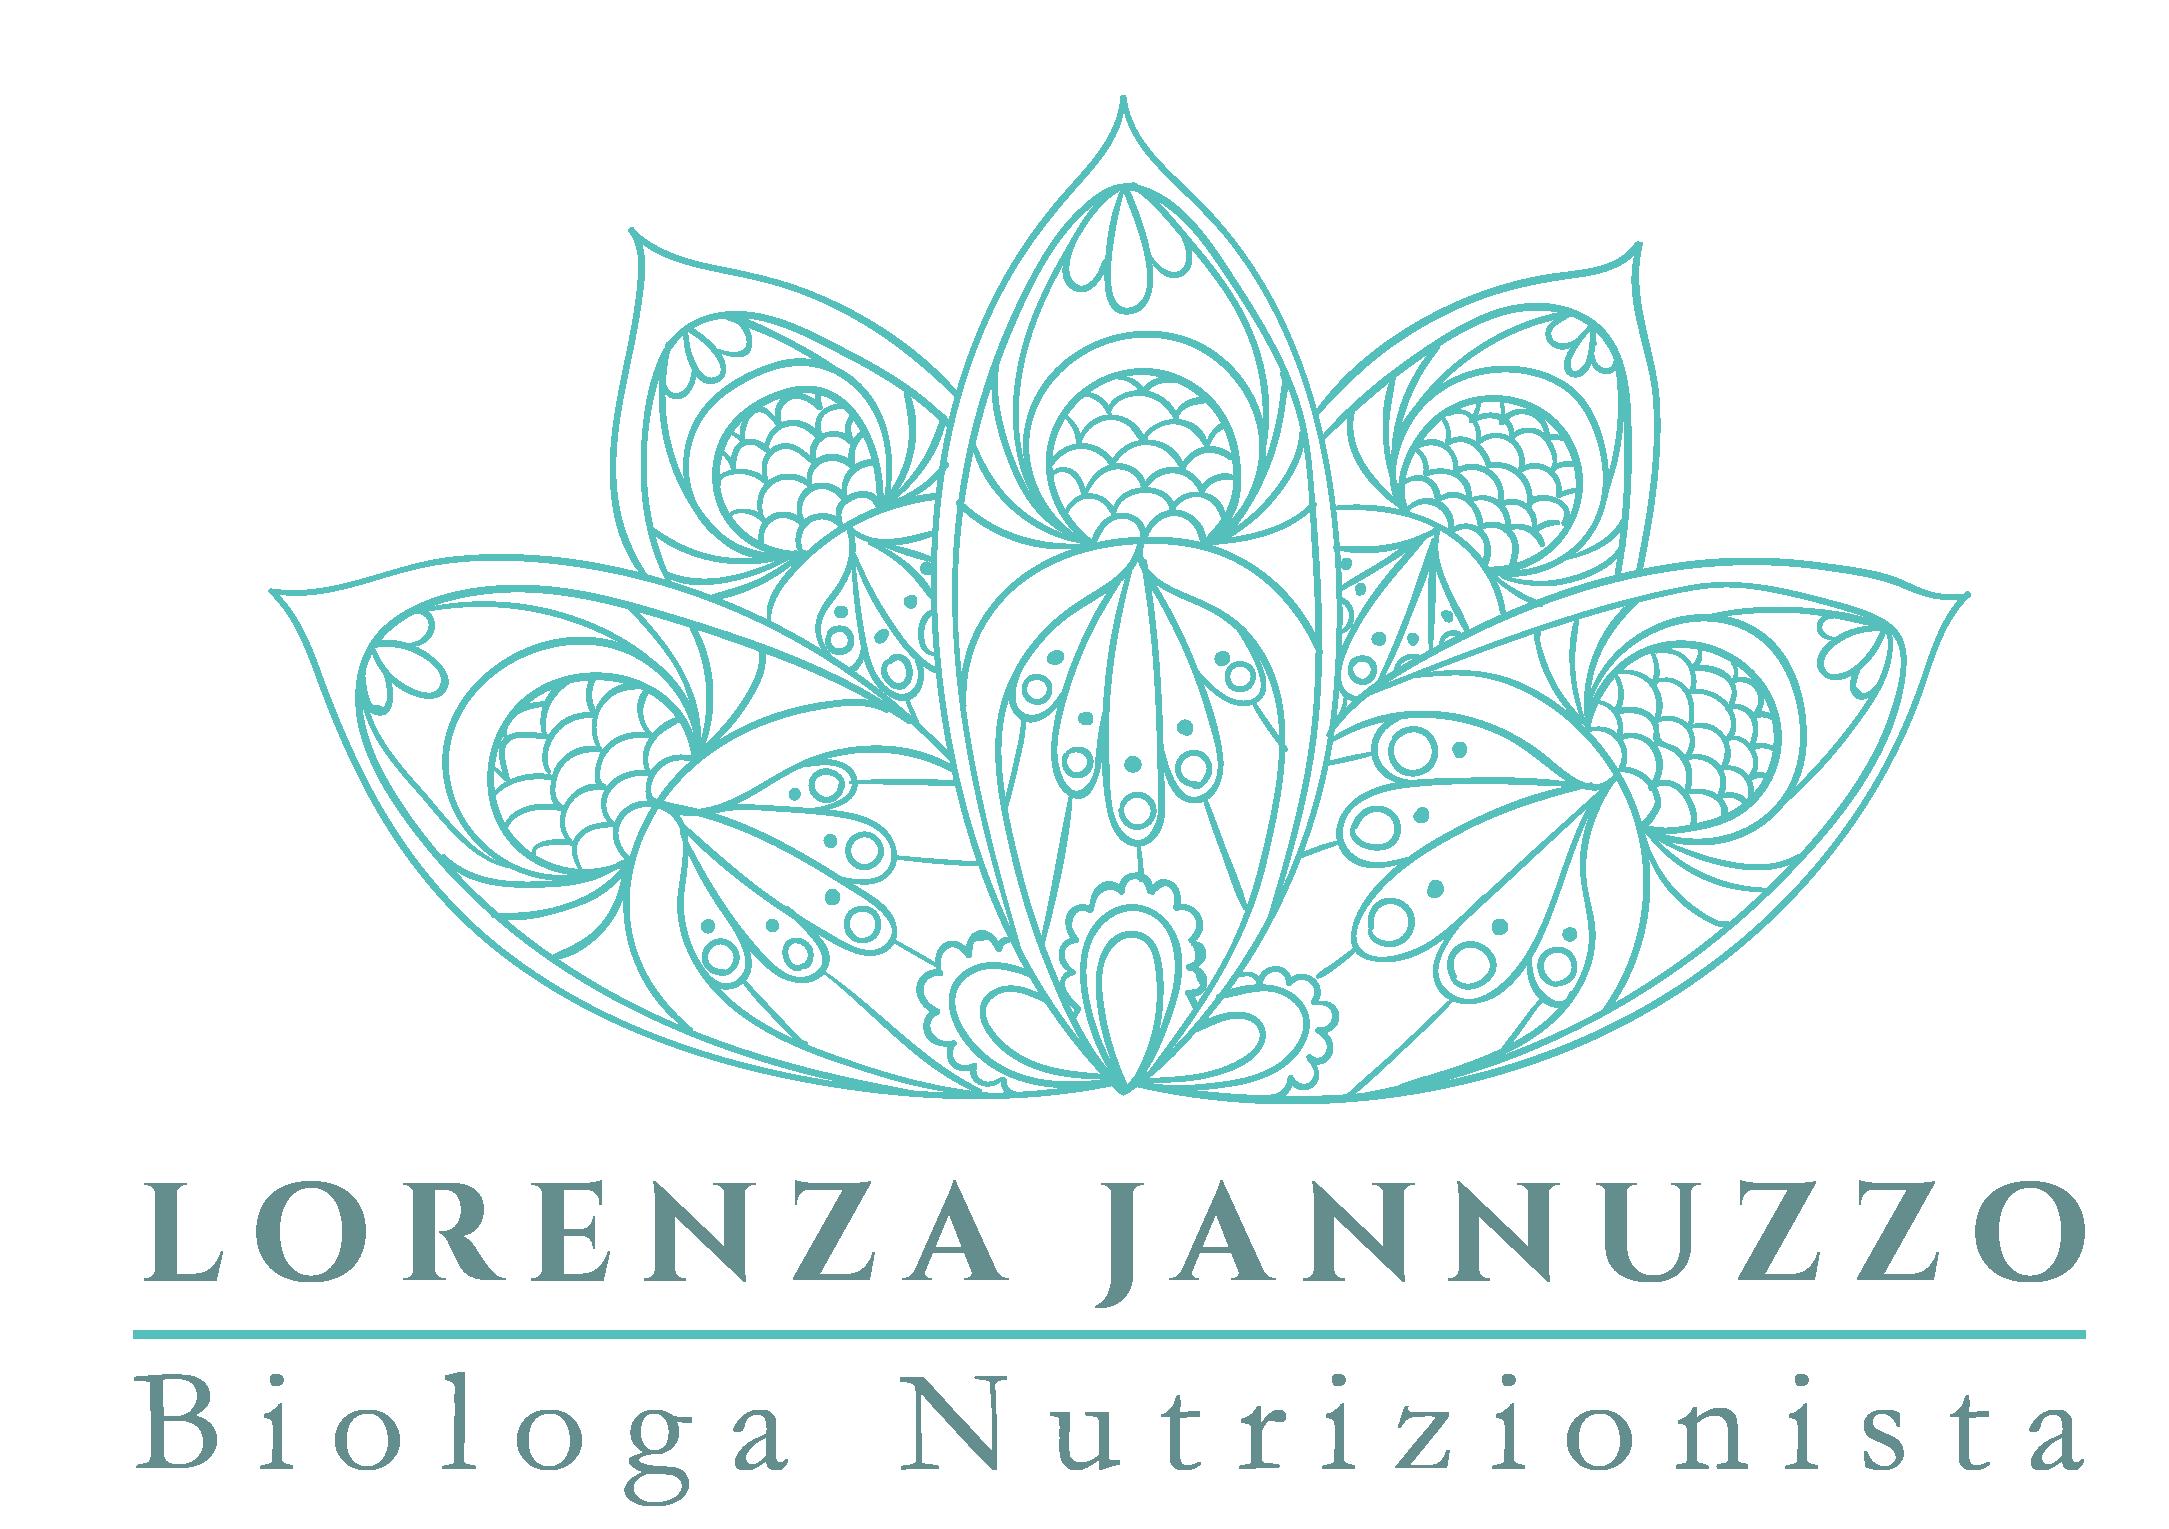 LorenzaJannuzzo.it